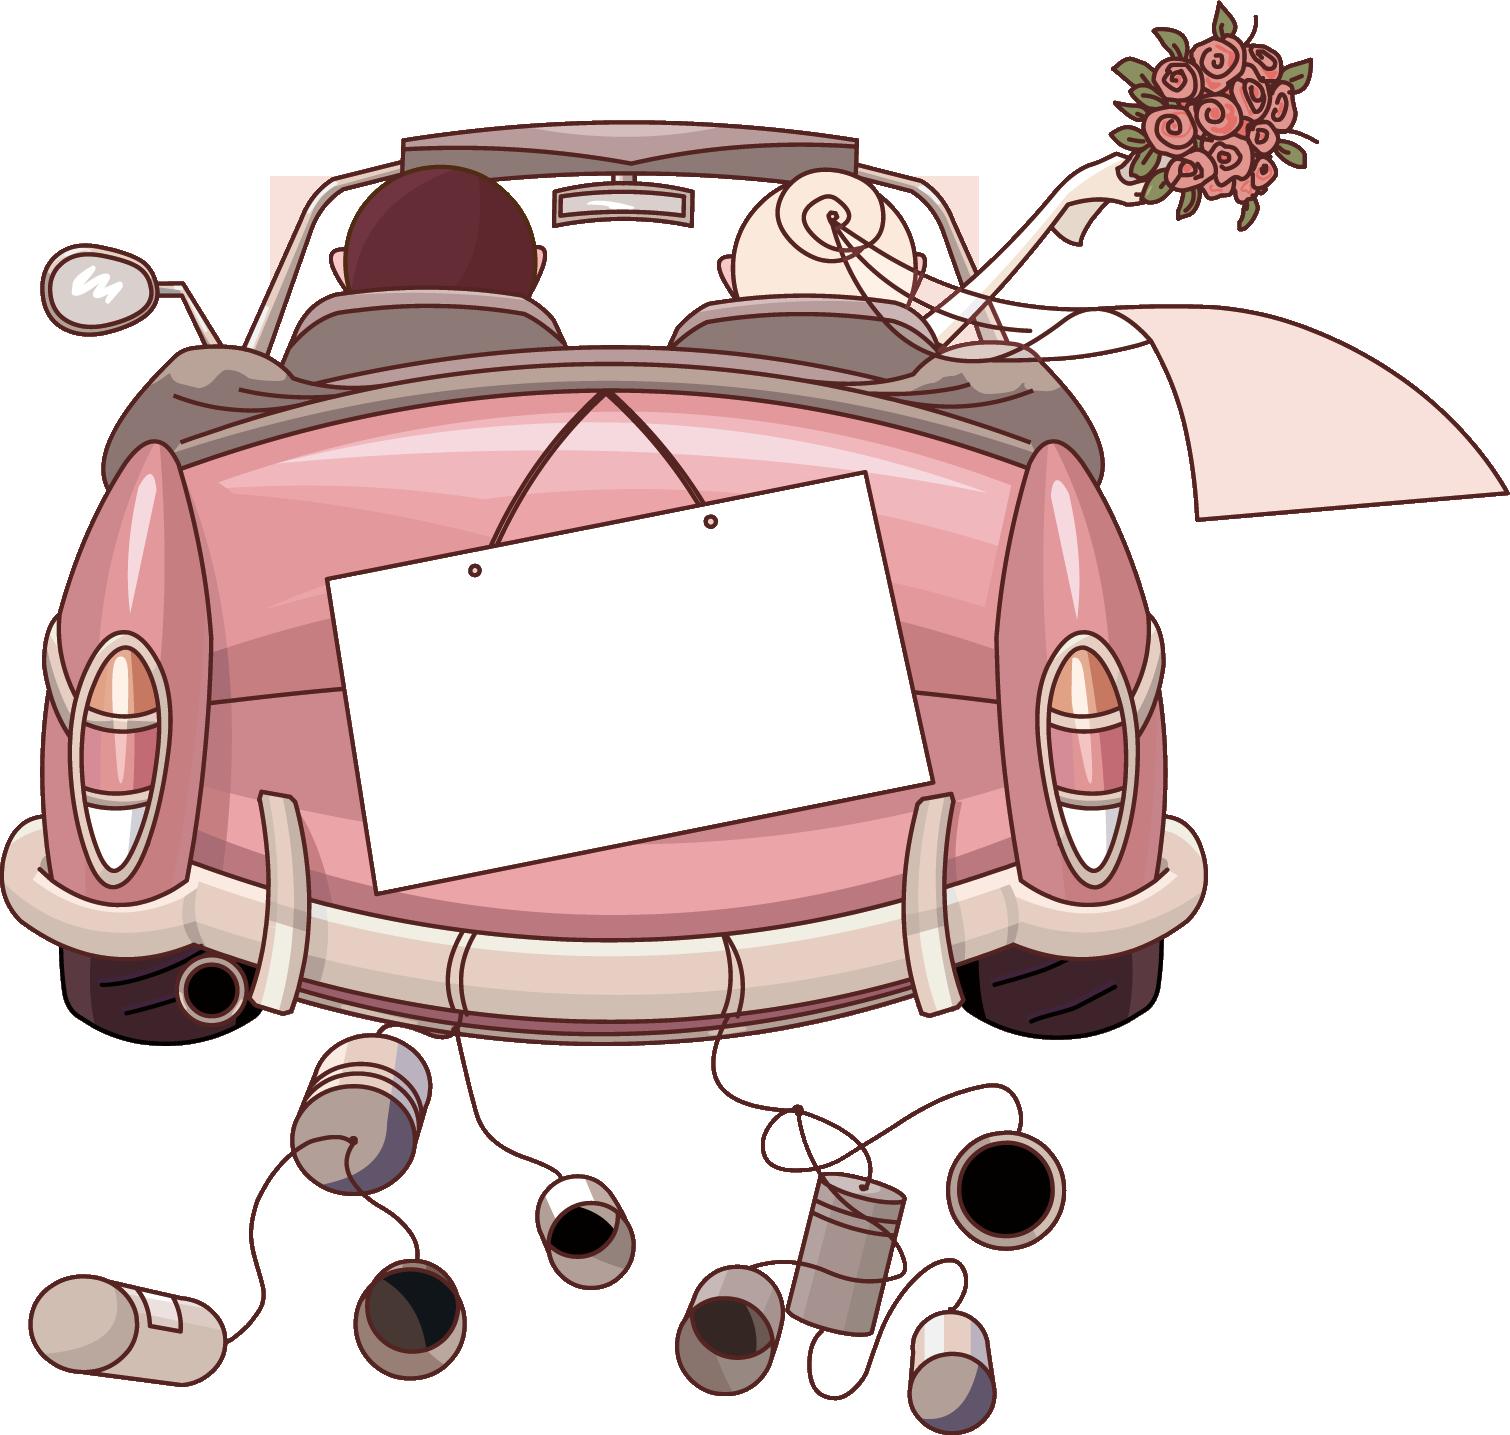 Car Wedding Invitation Clip Art Just Married 1510 1435 Transprent Png Free Download Car M Wedding Drawing Wedding Invitation Background Wedding Gift Money